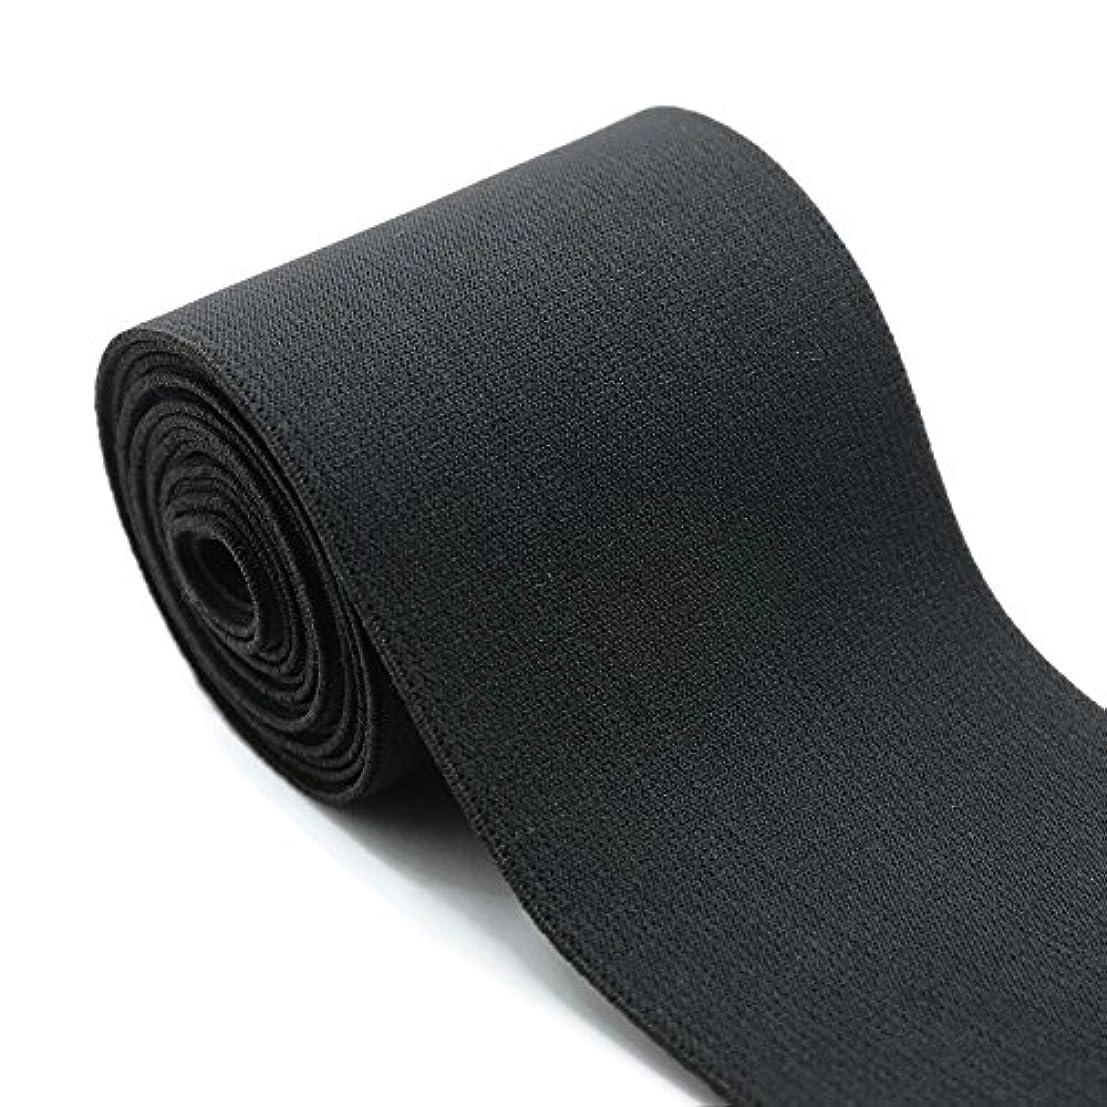 iCraft 3-inch Wide by 2-Yard Plush Black Elastic Band 14100